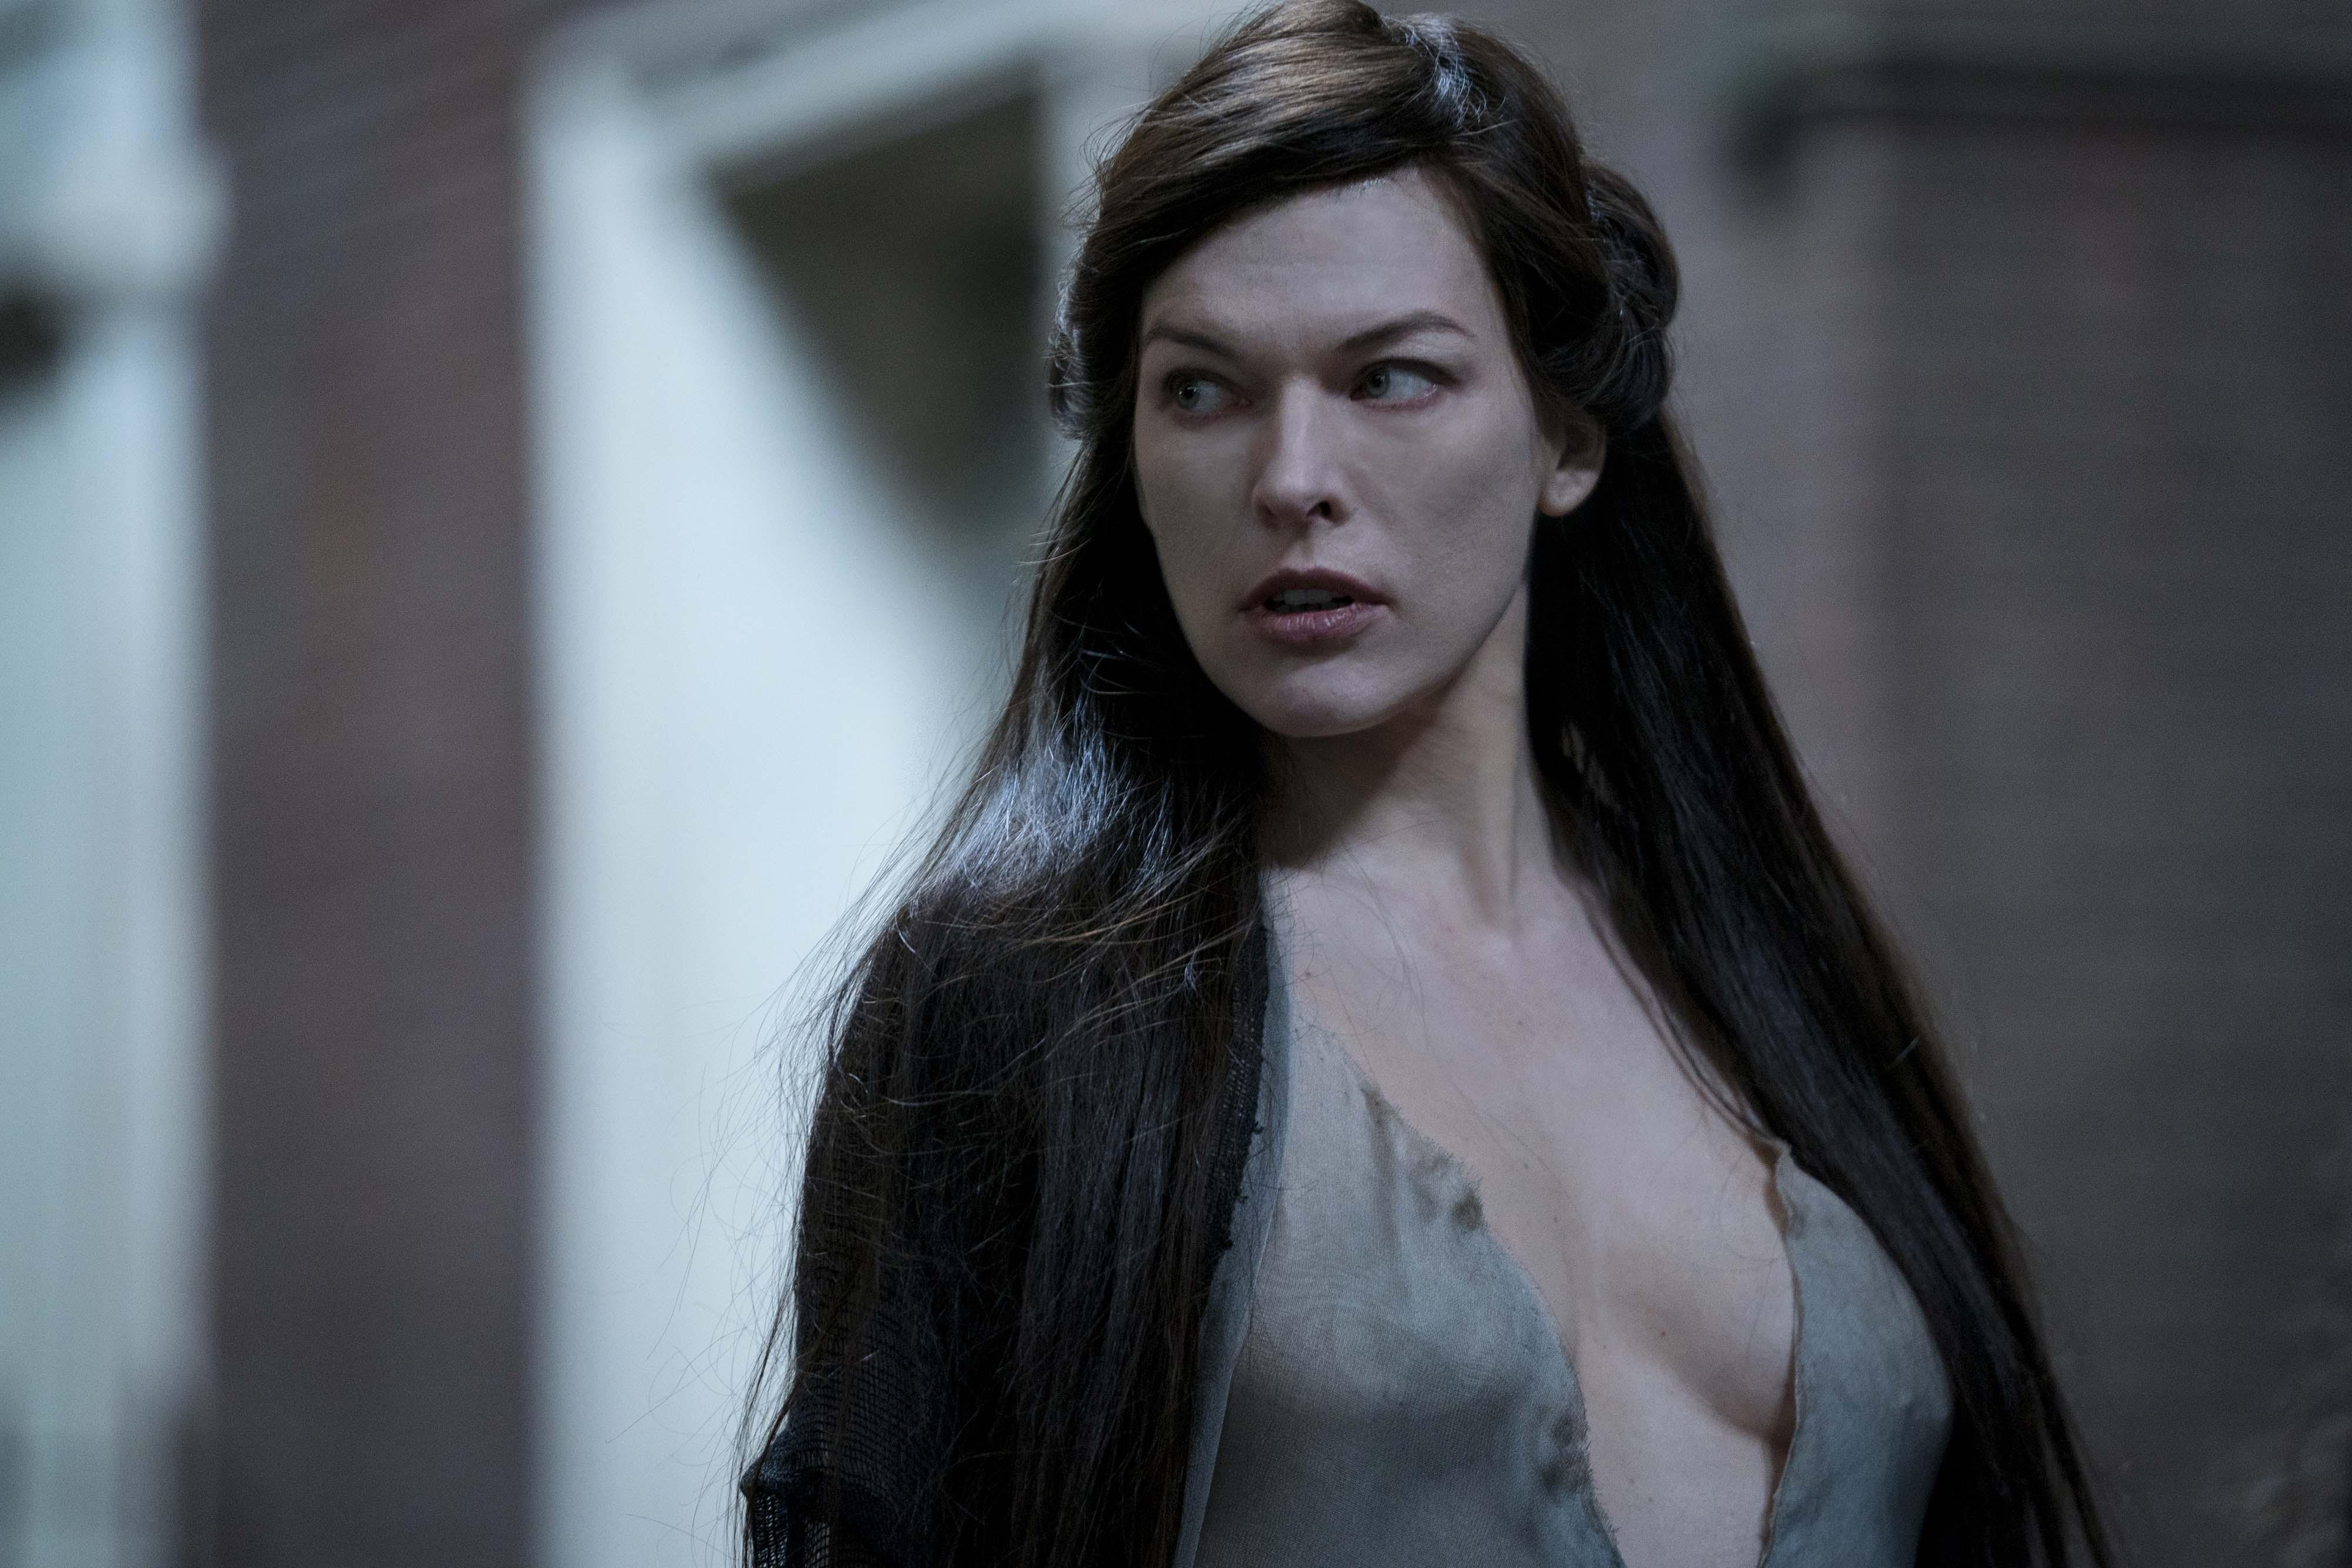 Milla jovovich blood queen in hellboy 2019 hd movies 4k - Milla jovovich 4k wallpaper ...